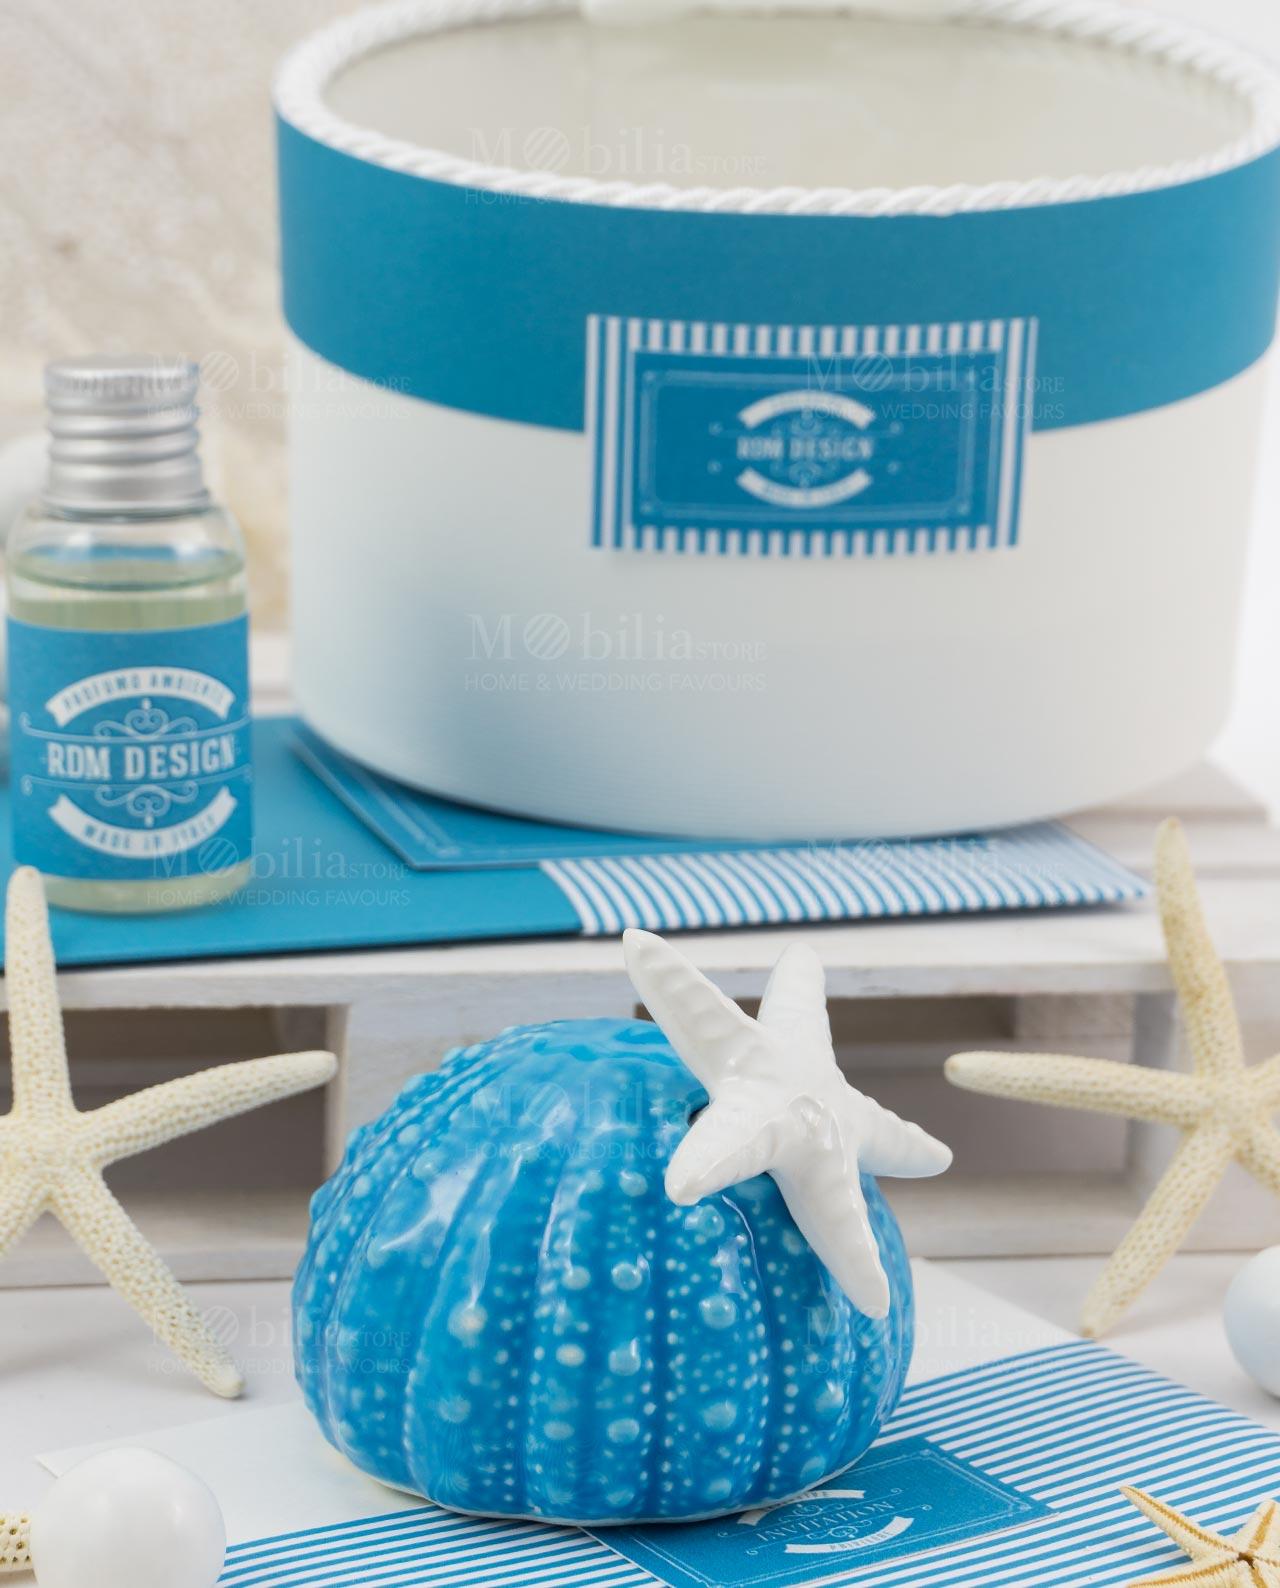 Bomboniera profumatore blu con fragranza linea Oceania Rdm